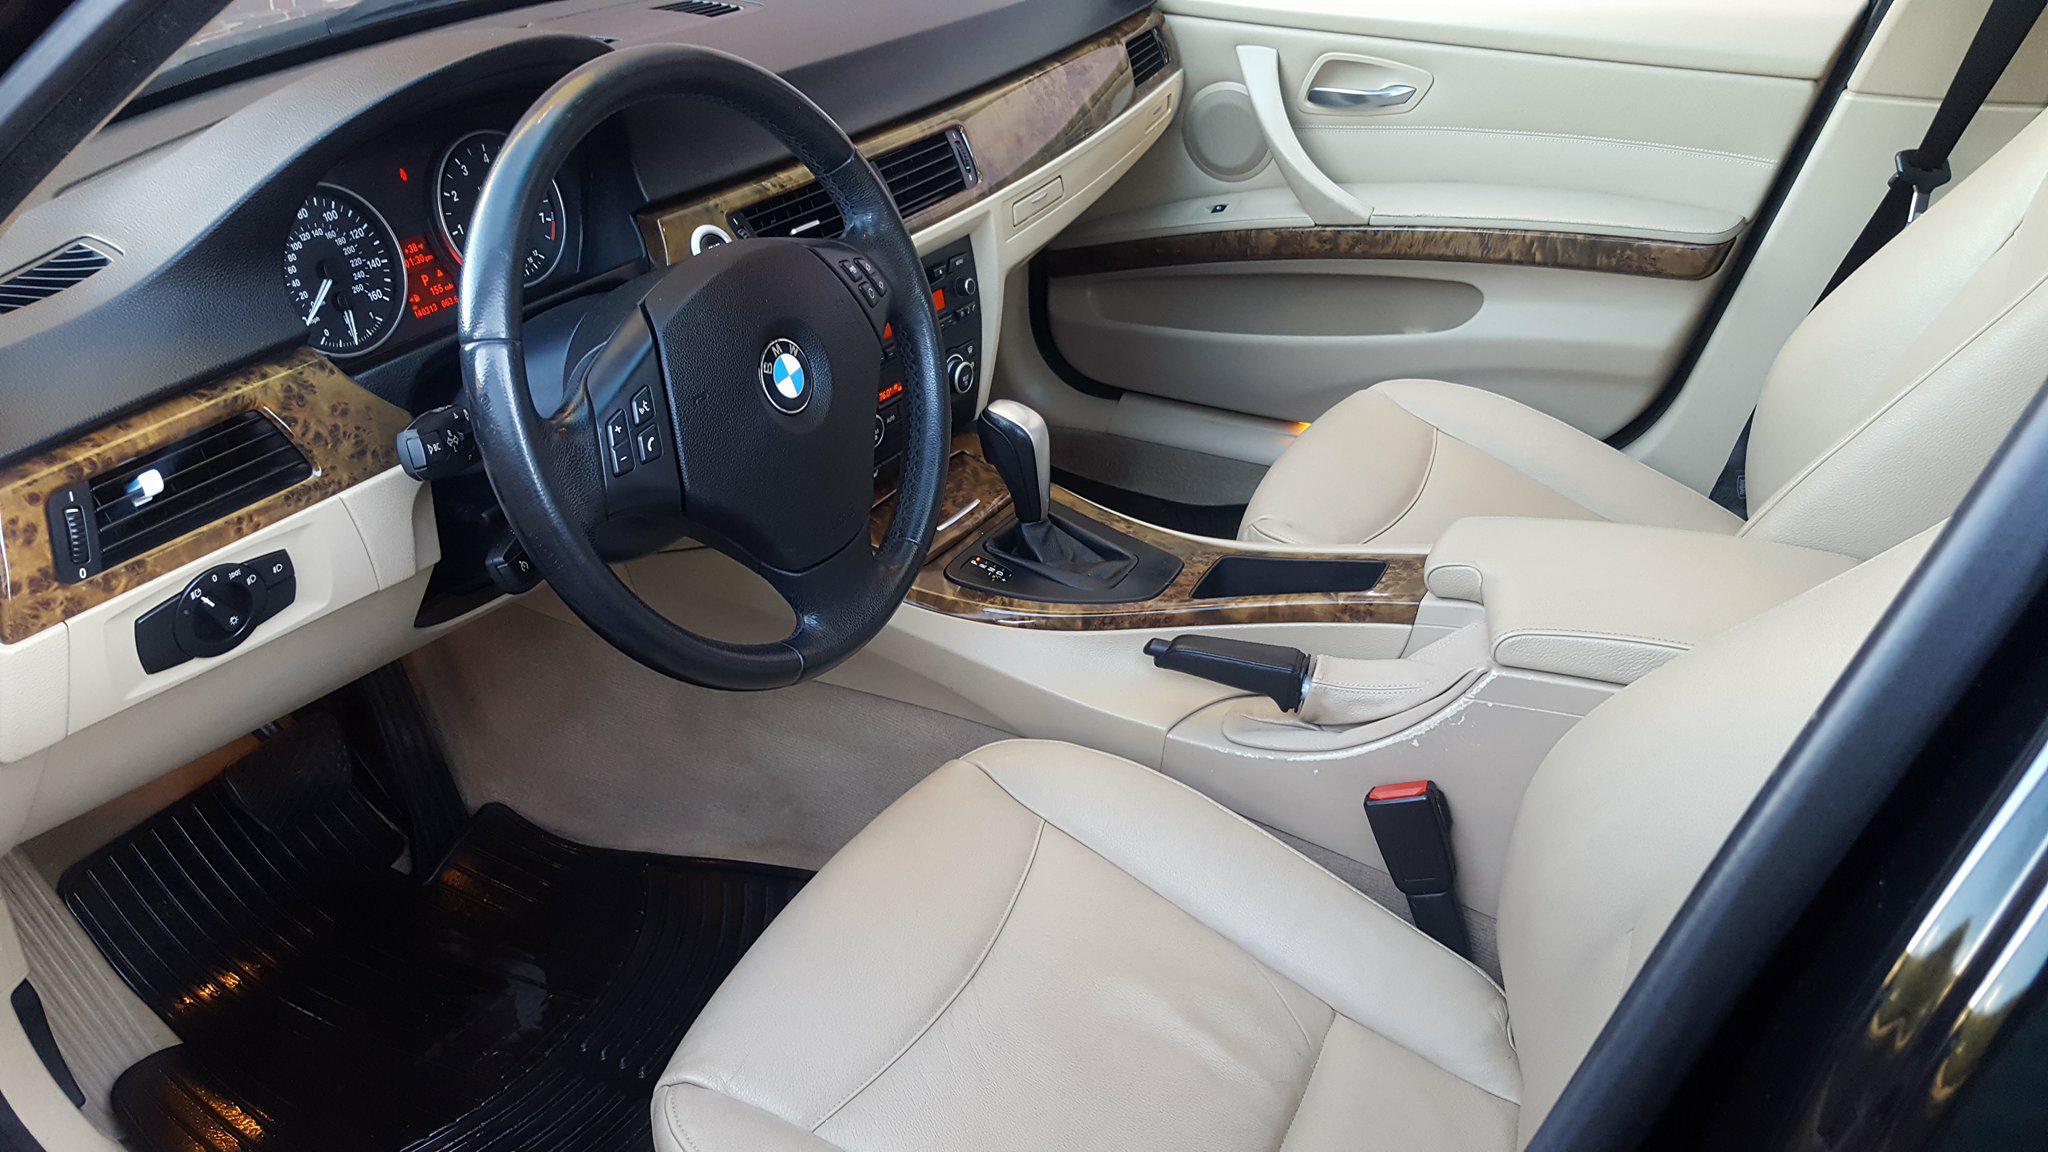 328xi 2007 - 2018 - 2019 New Car Reviews by Language Kompis